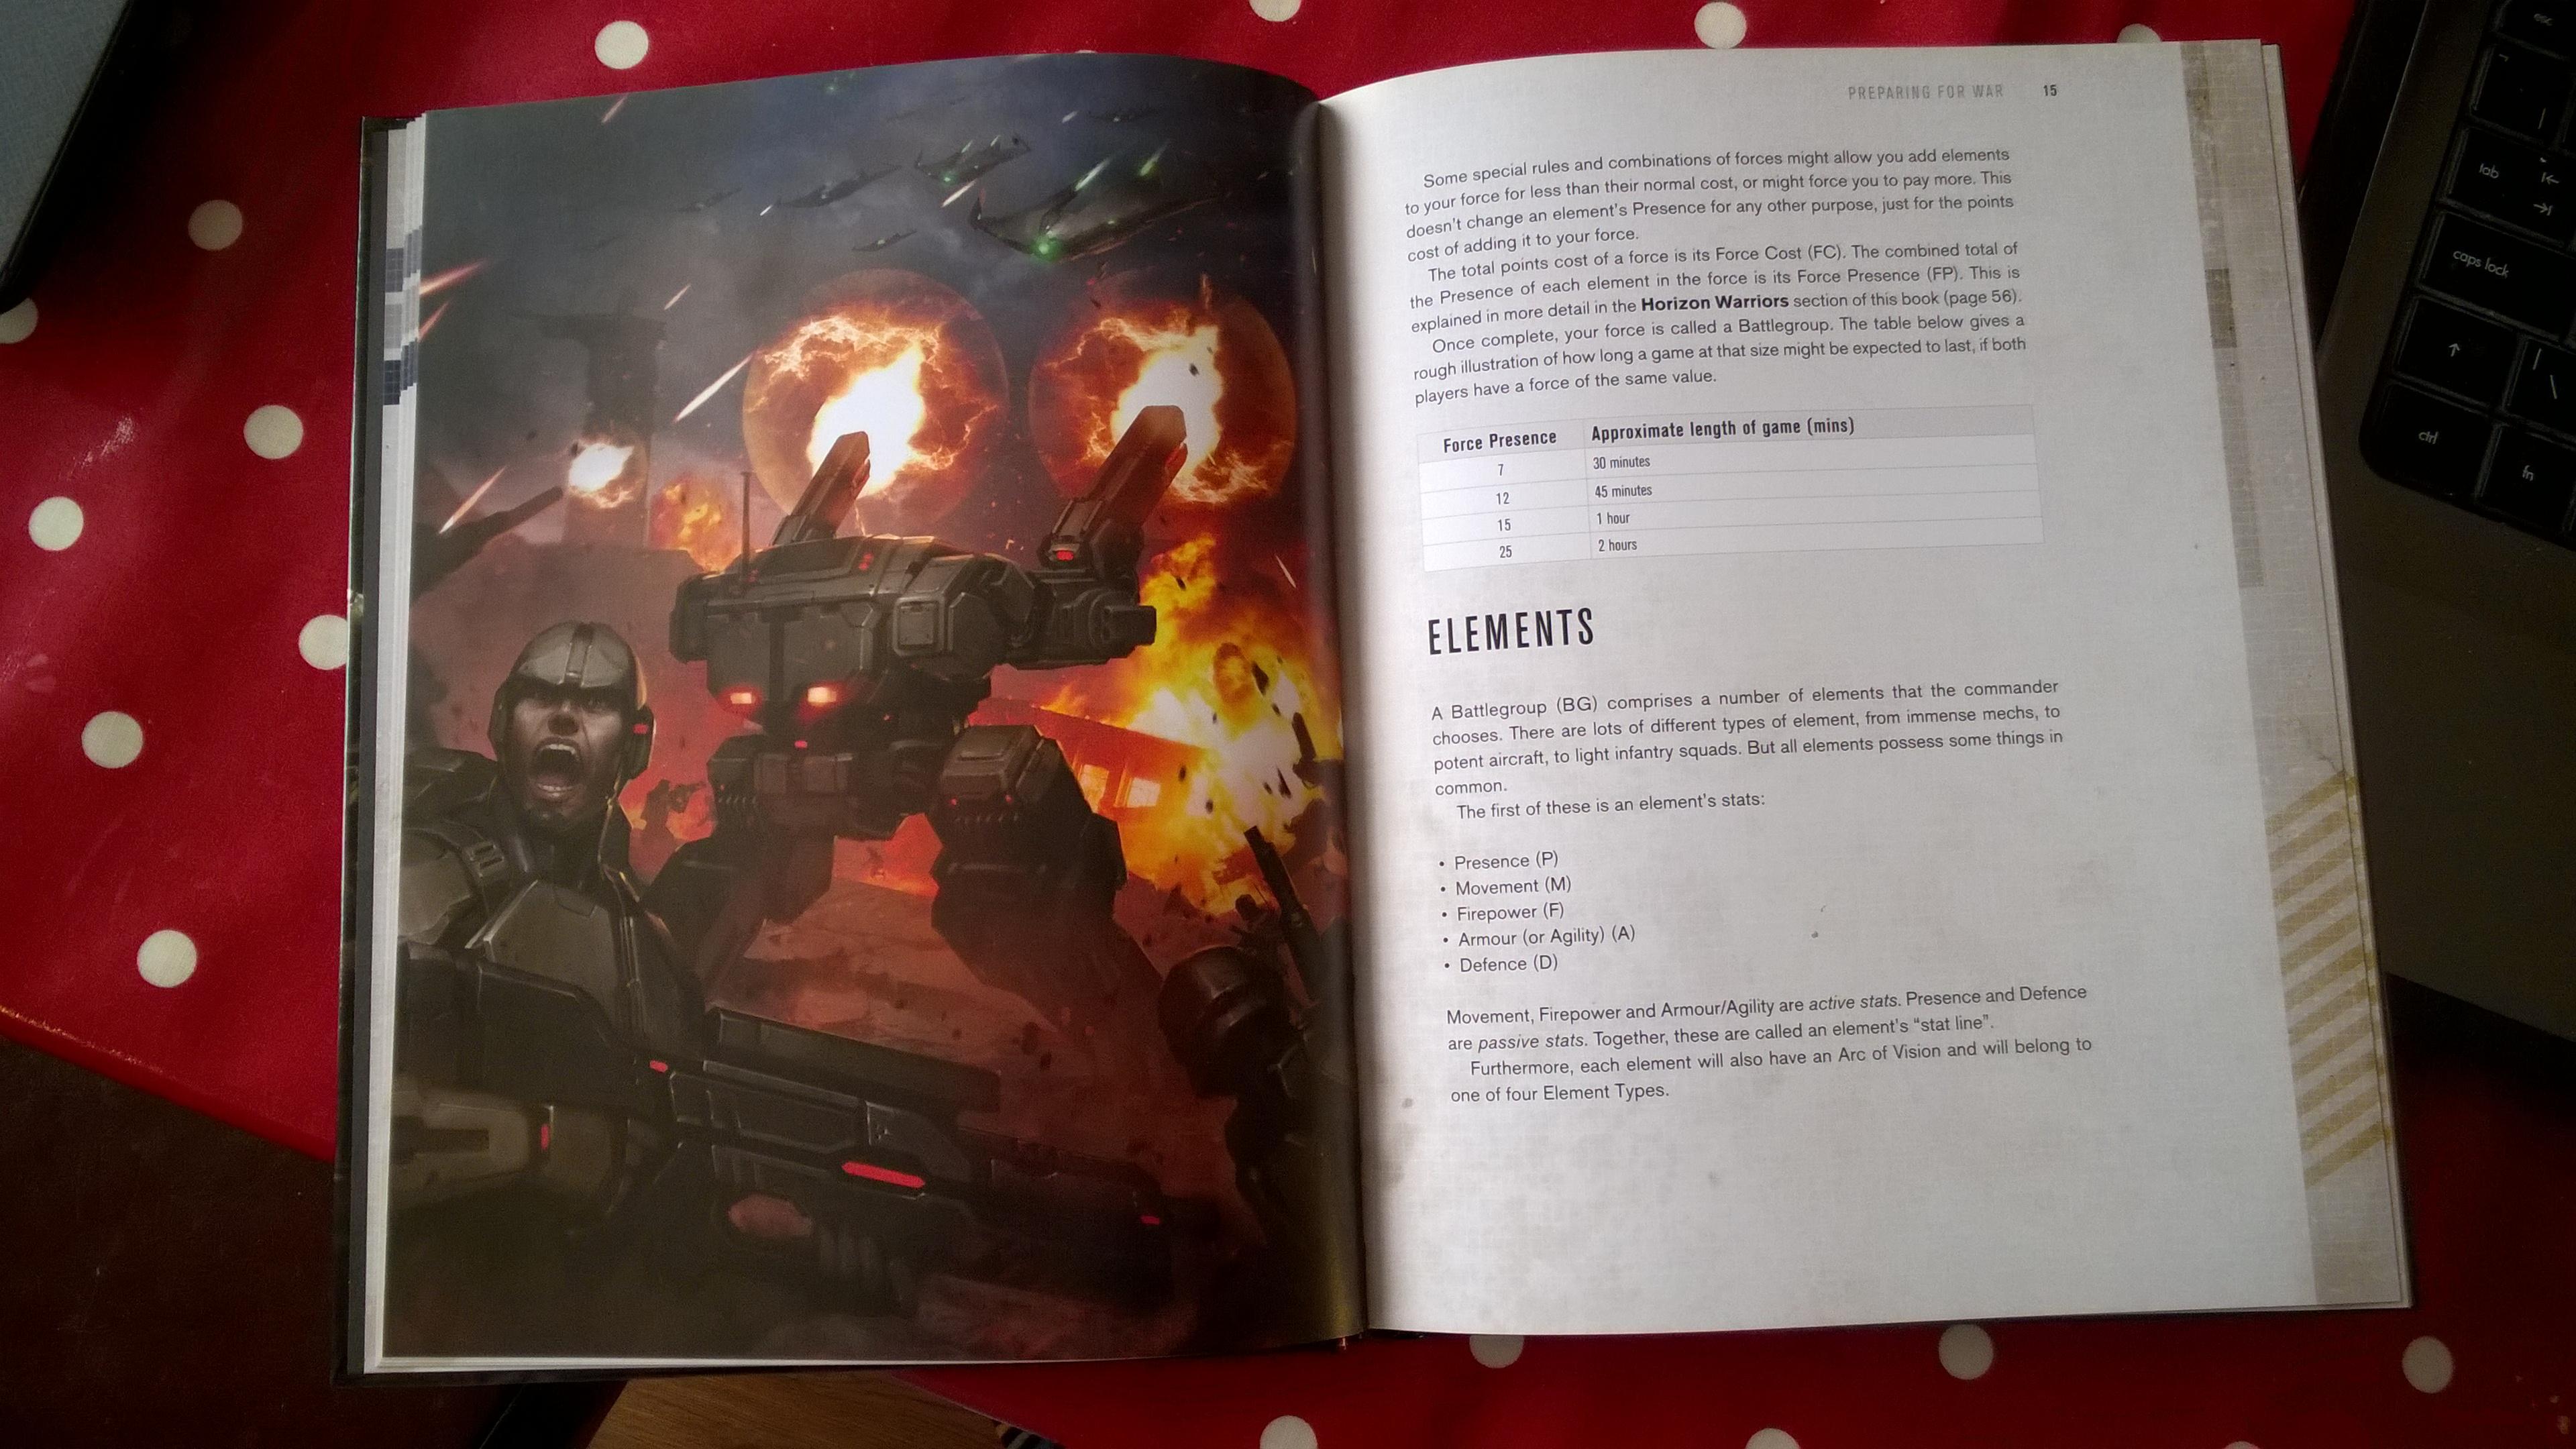 6mm, Brigade Models, Em4, Horizonwars, Rulebook, Rules, Science-fiction, Scifi